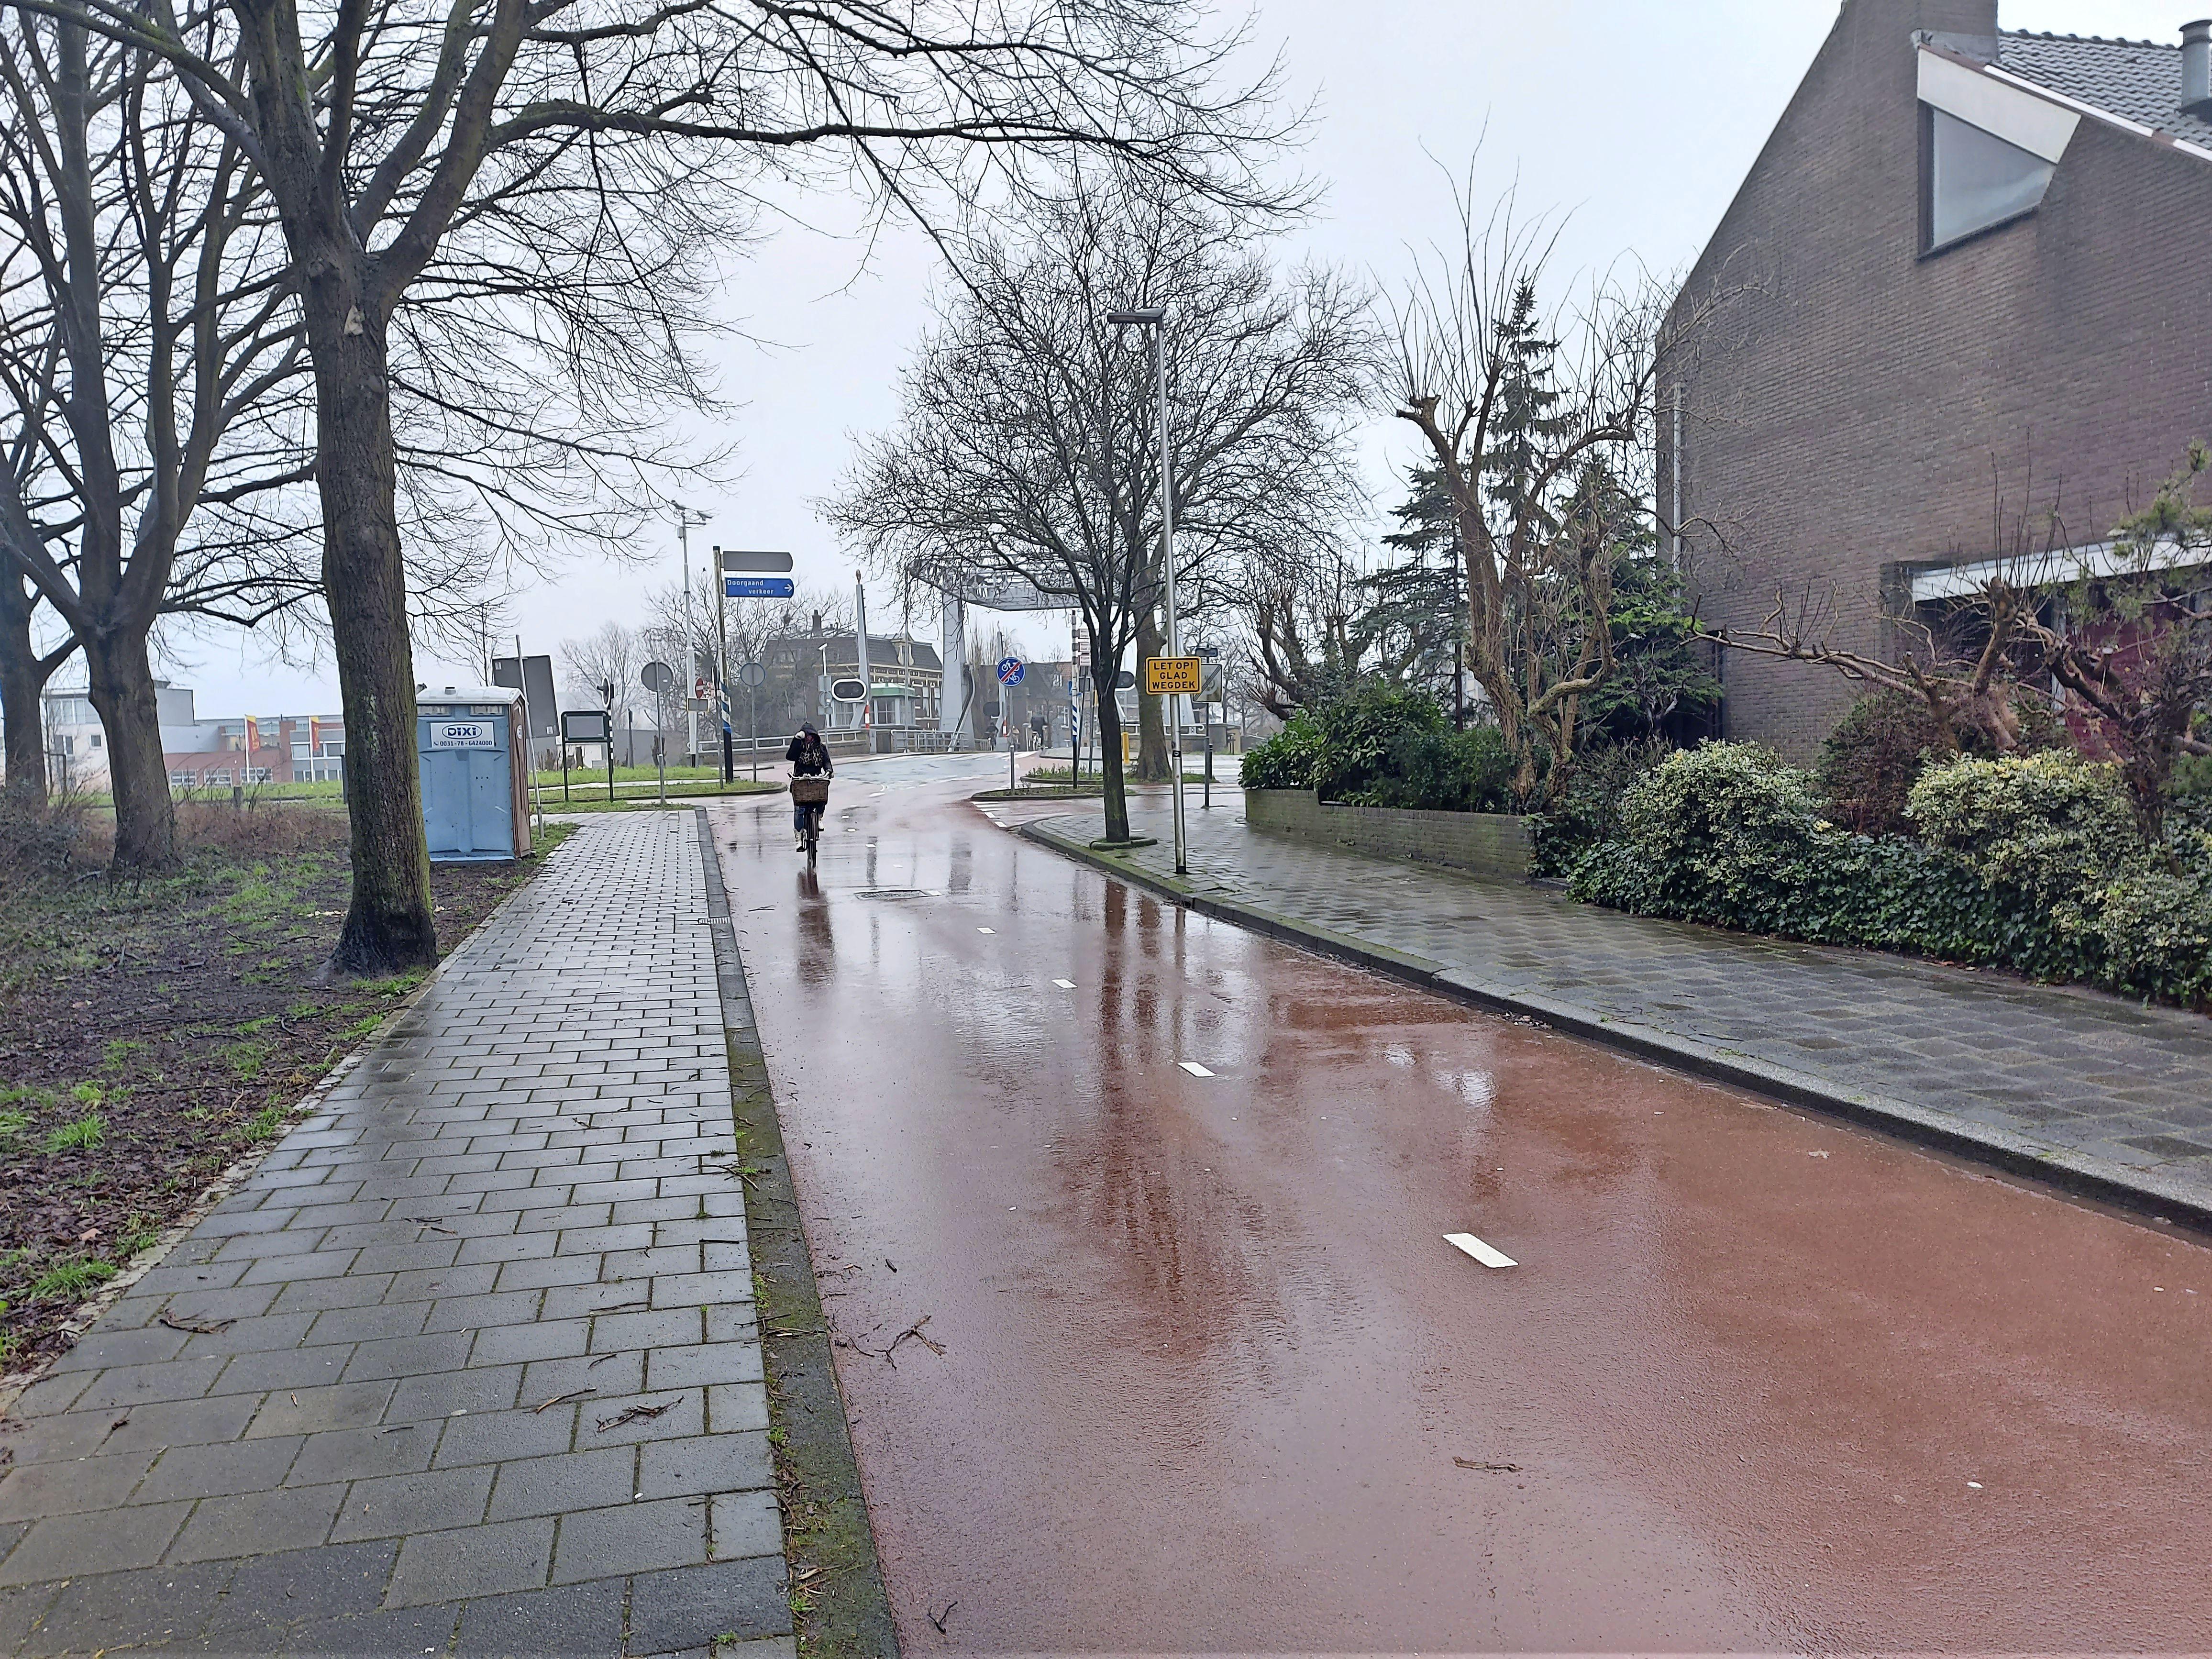 Hoeveelheid sluipverkeer op Splinterlaan valt wel mee, zegt de gemeente Leiderdorp